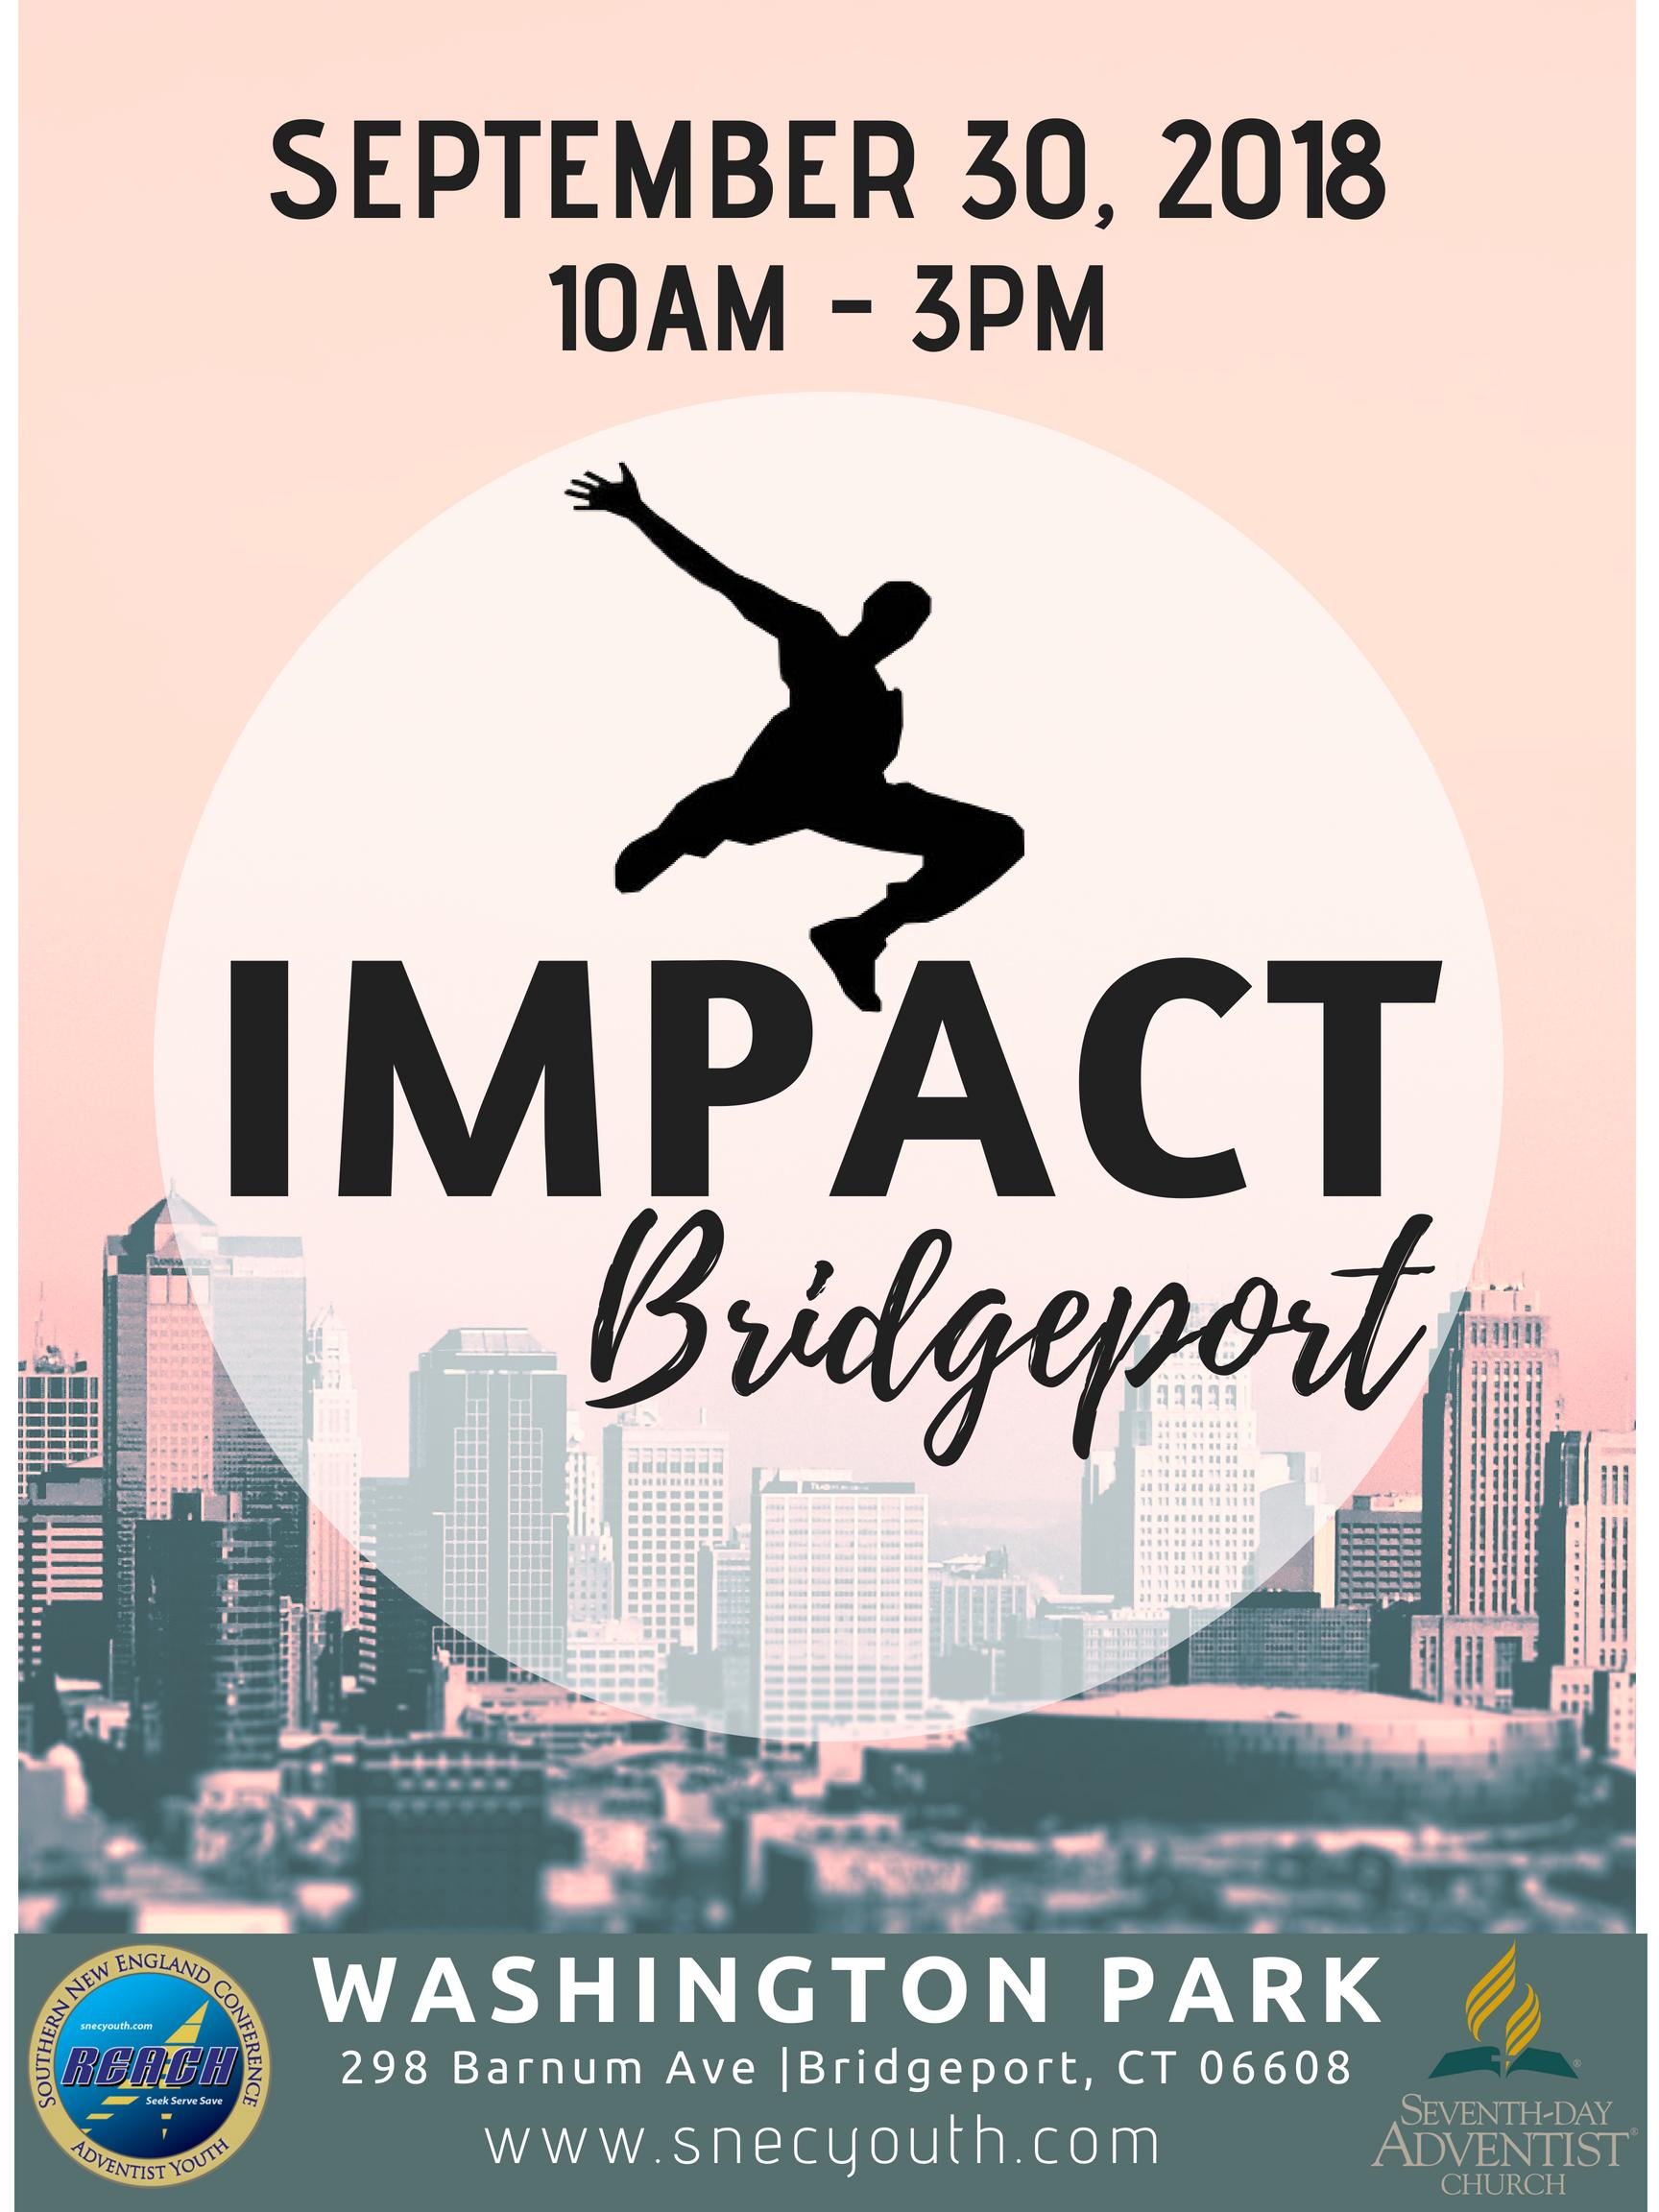 IMPACT BRIDGEPORT